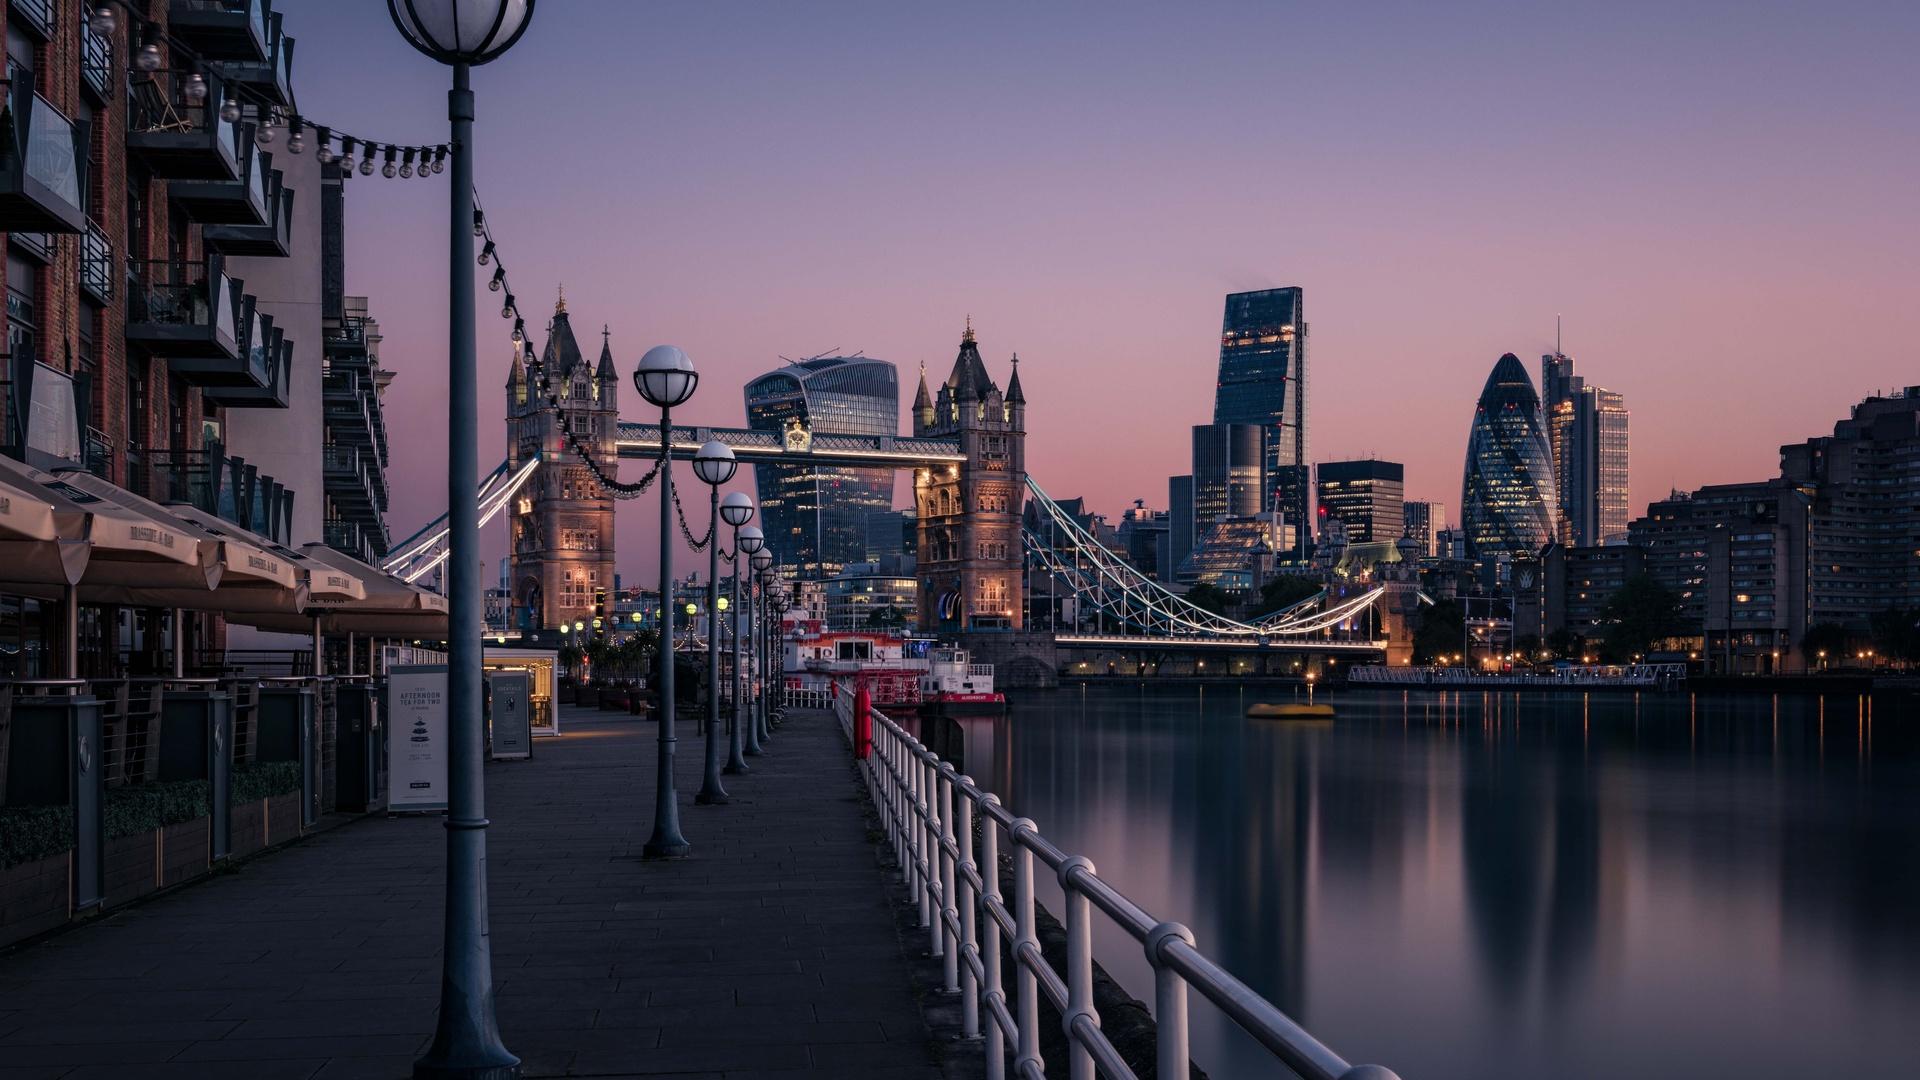 1920x1080 London England Tower Bridge Thames River